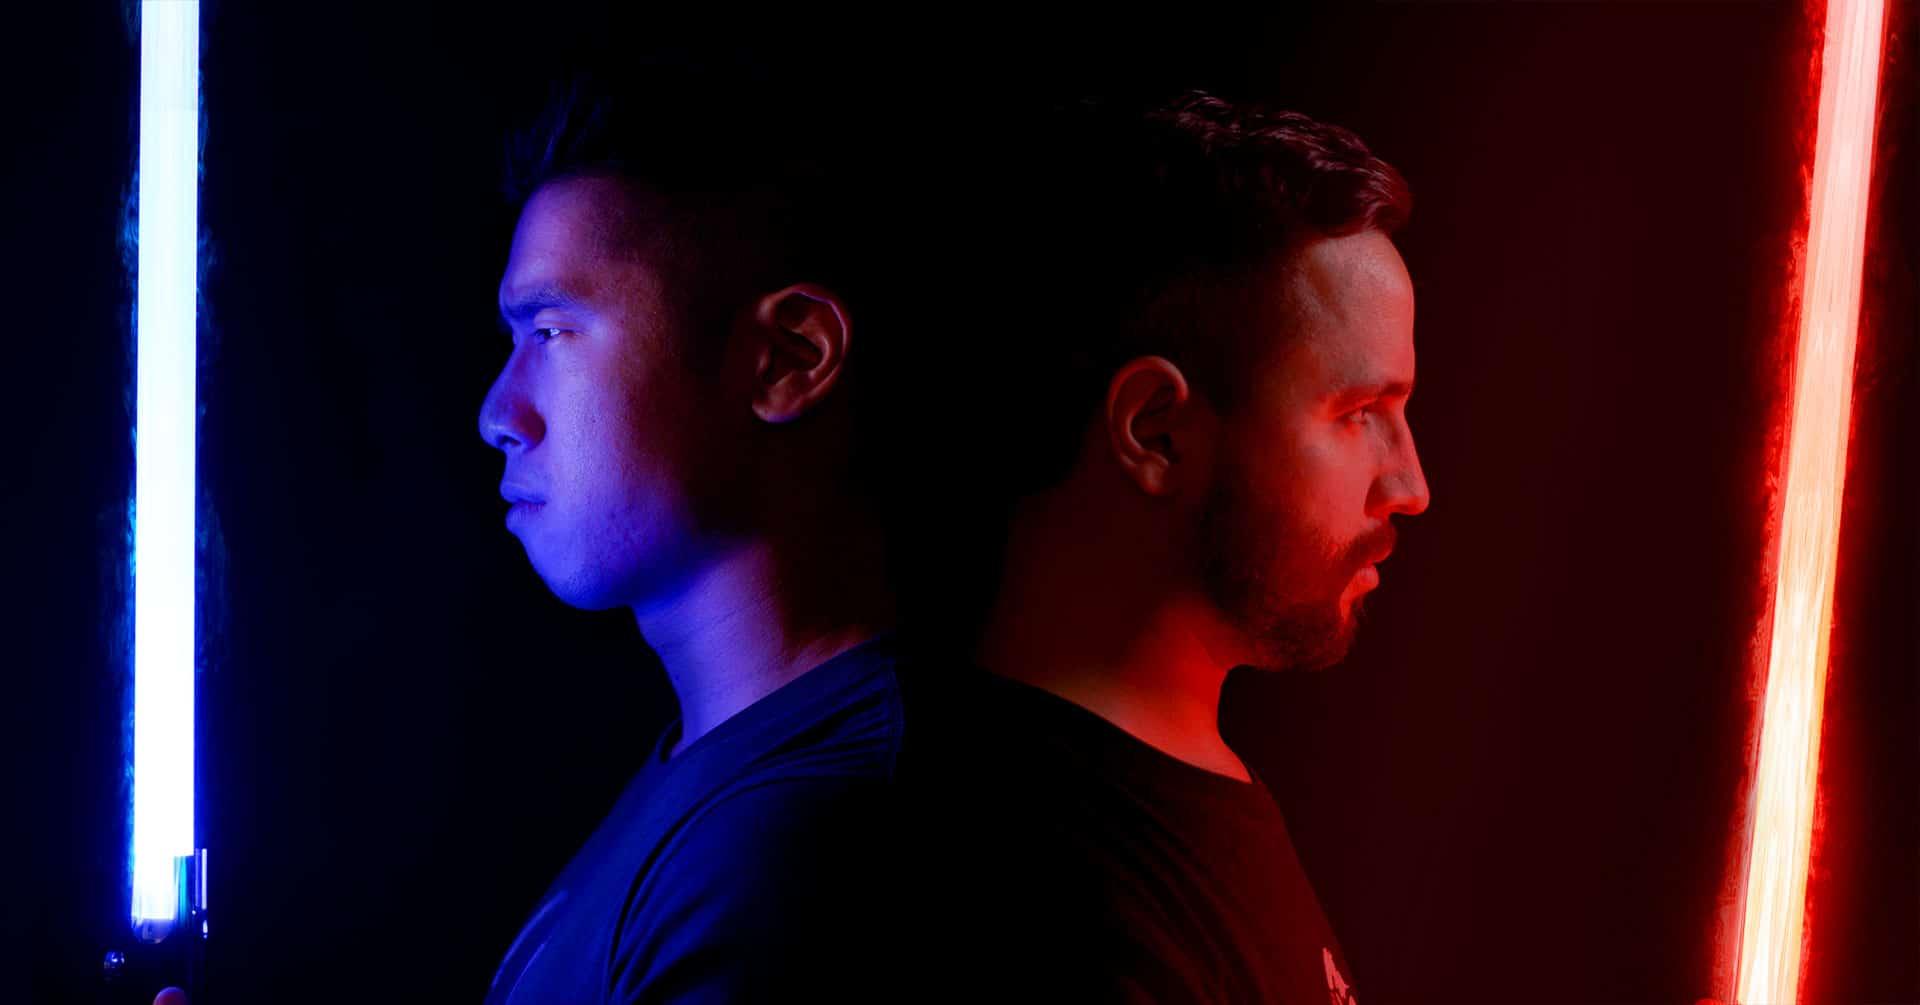 Kyberlight Lightsaber Review